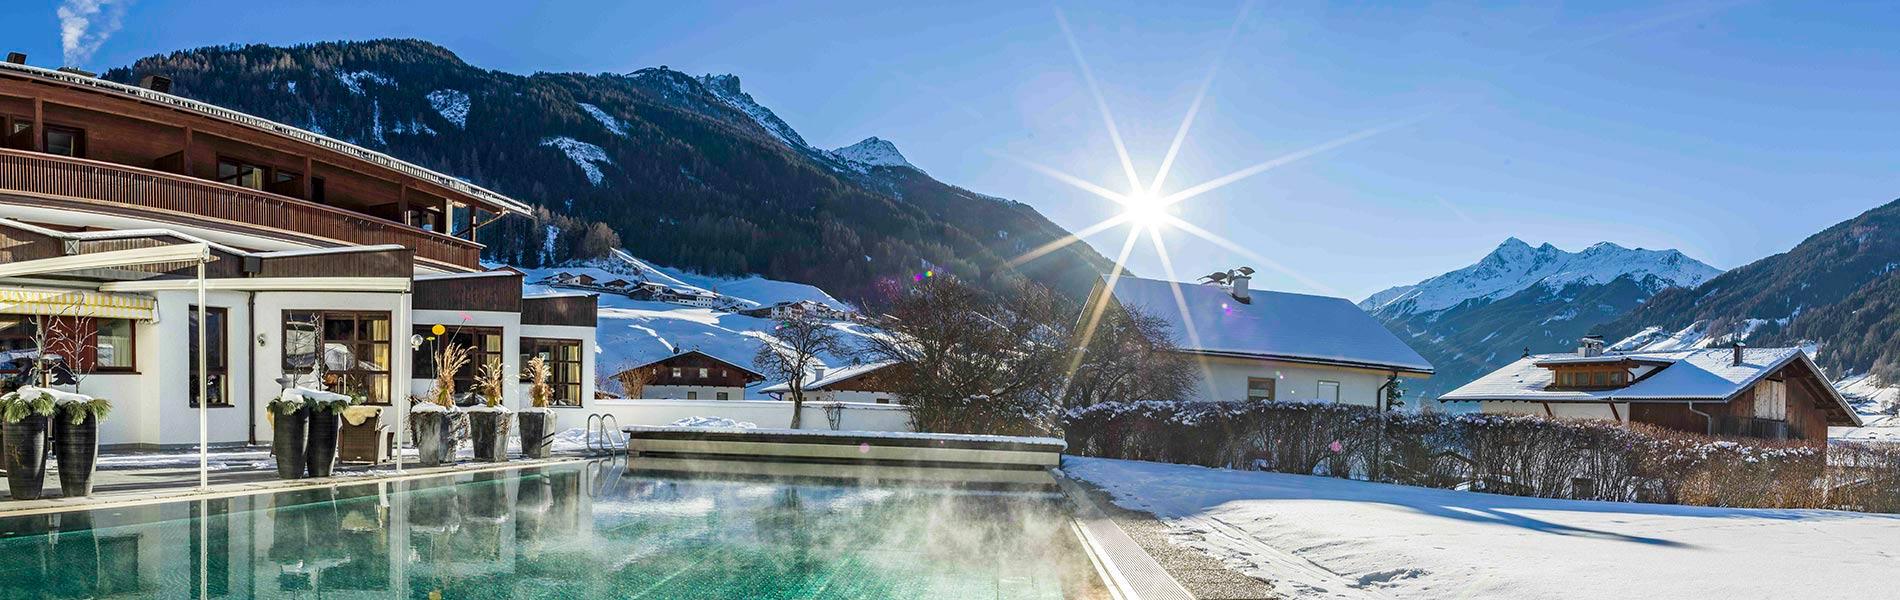 Happy-Stubai-Hotel-Neustift-Tirol-Austria-Hostel-Winterurlaub